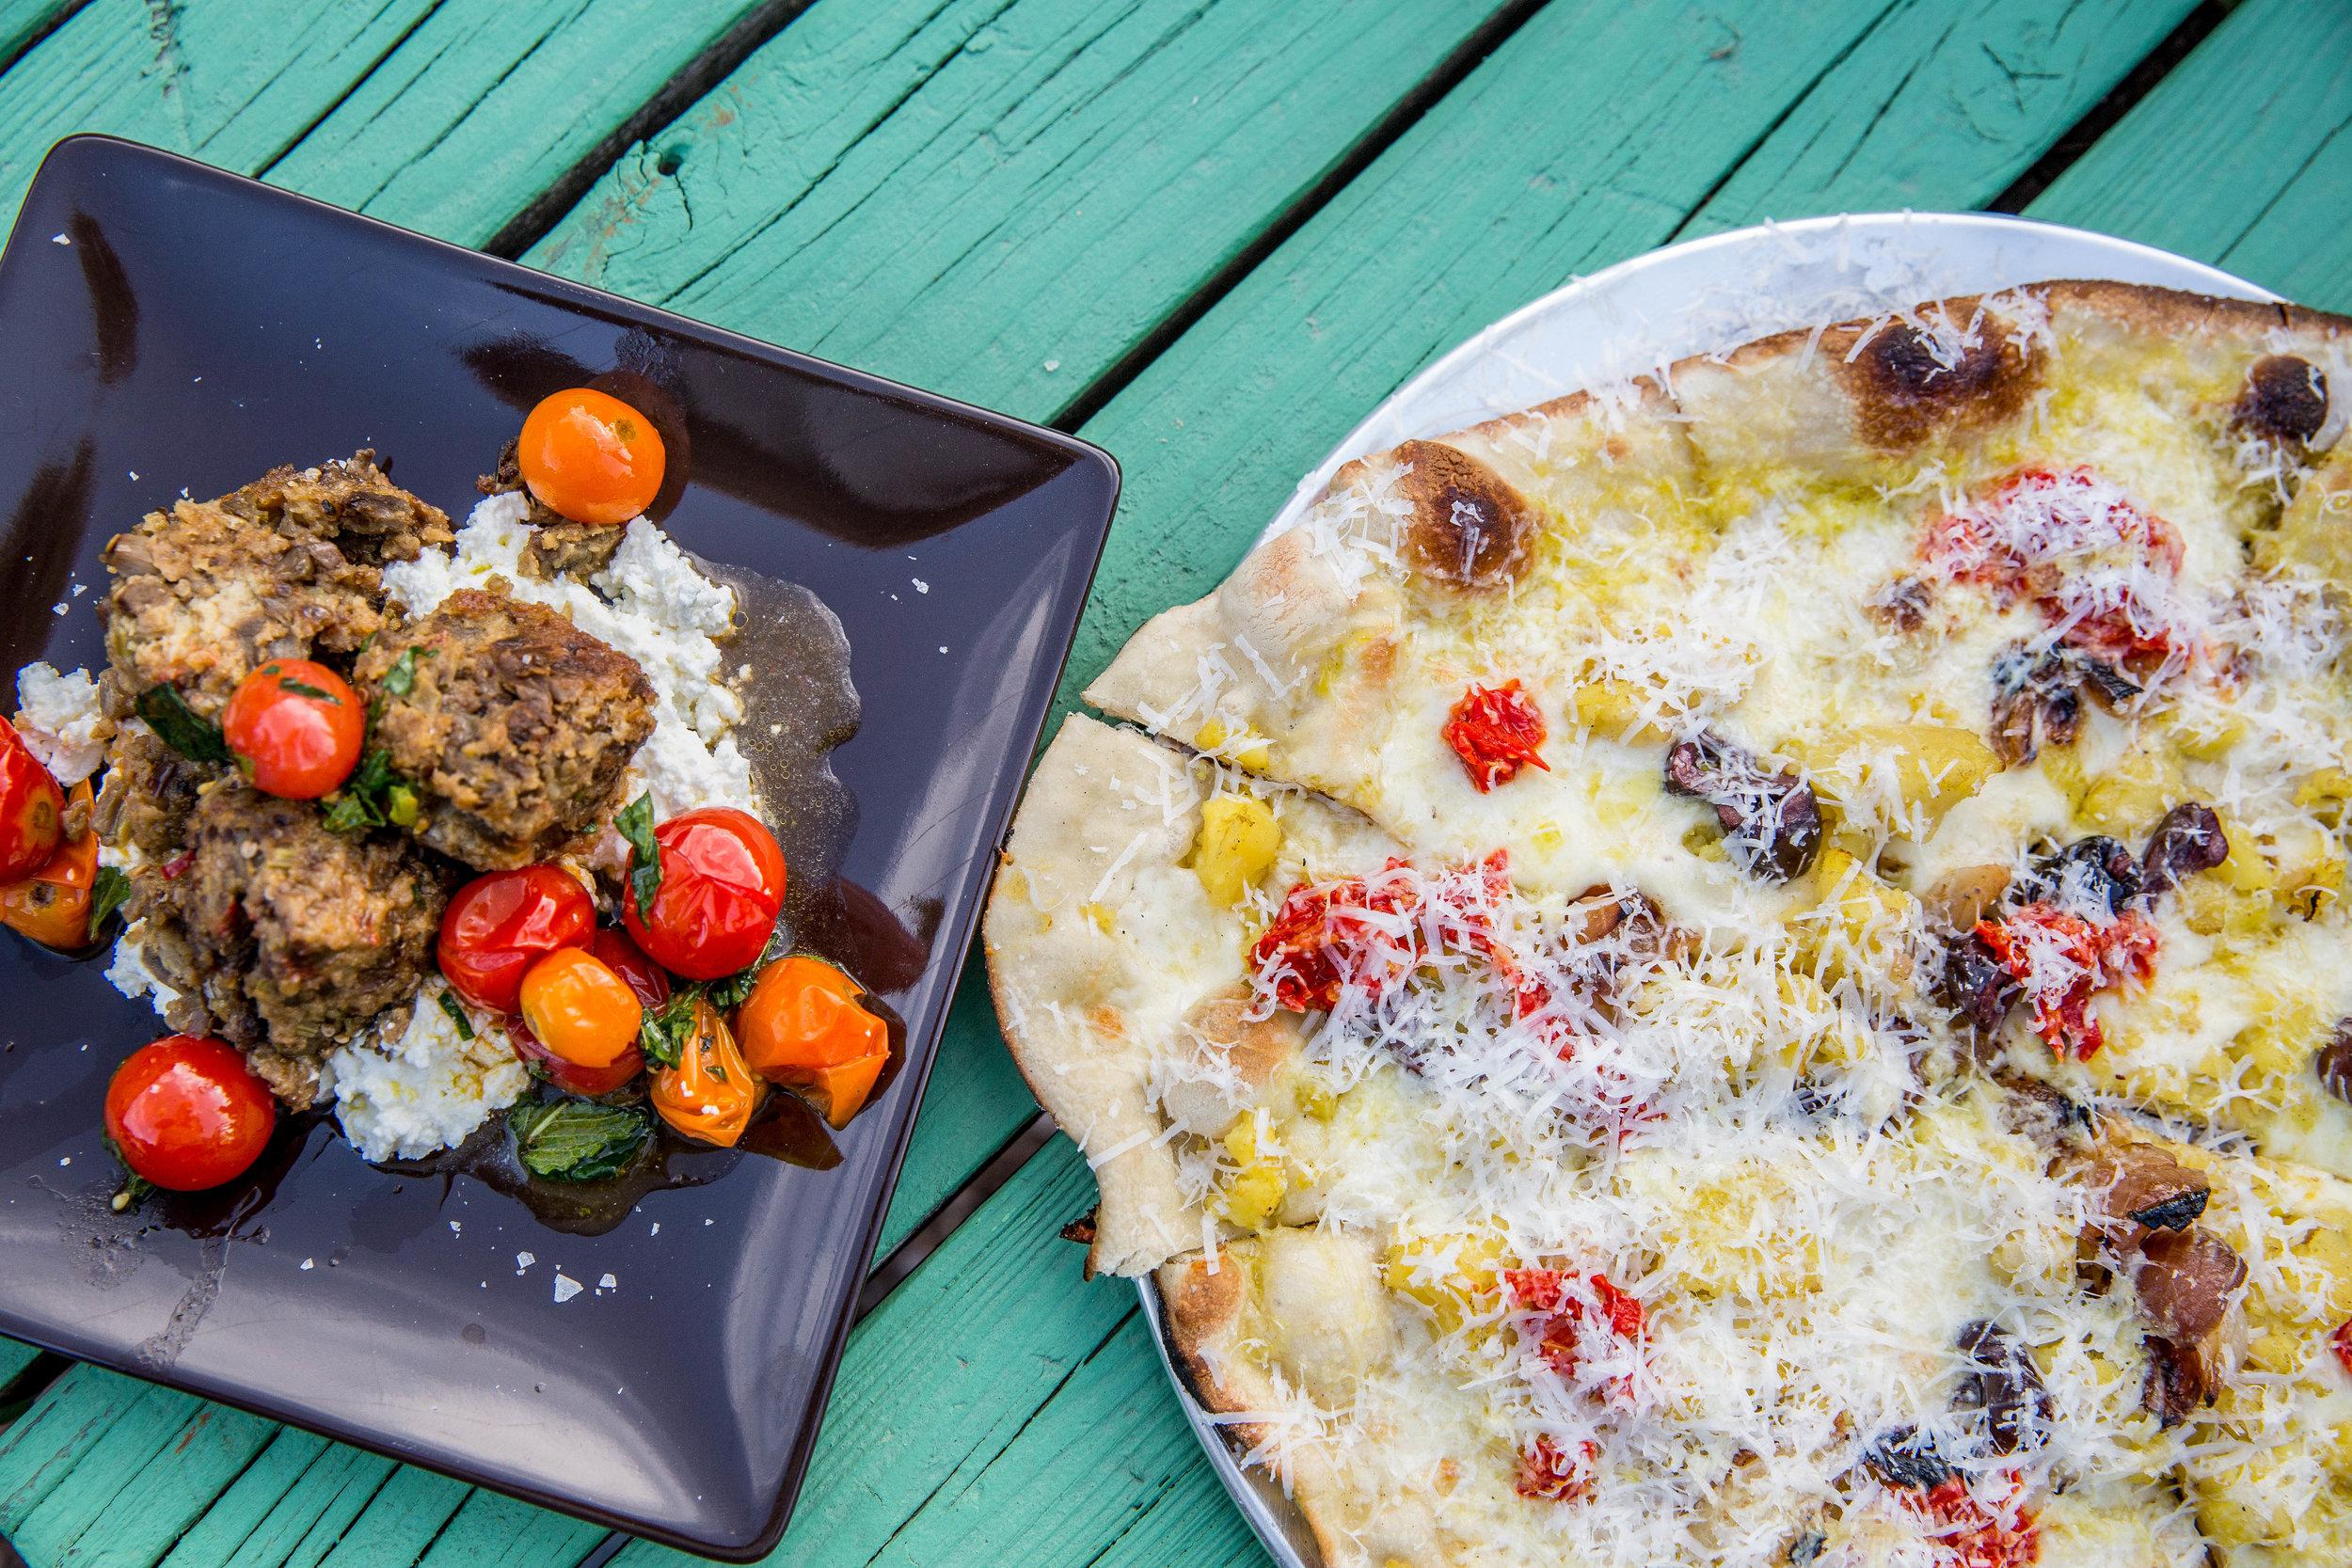 Coronato_Pizza_Pop_Up-95.jpg